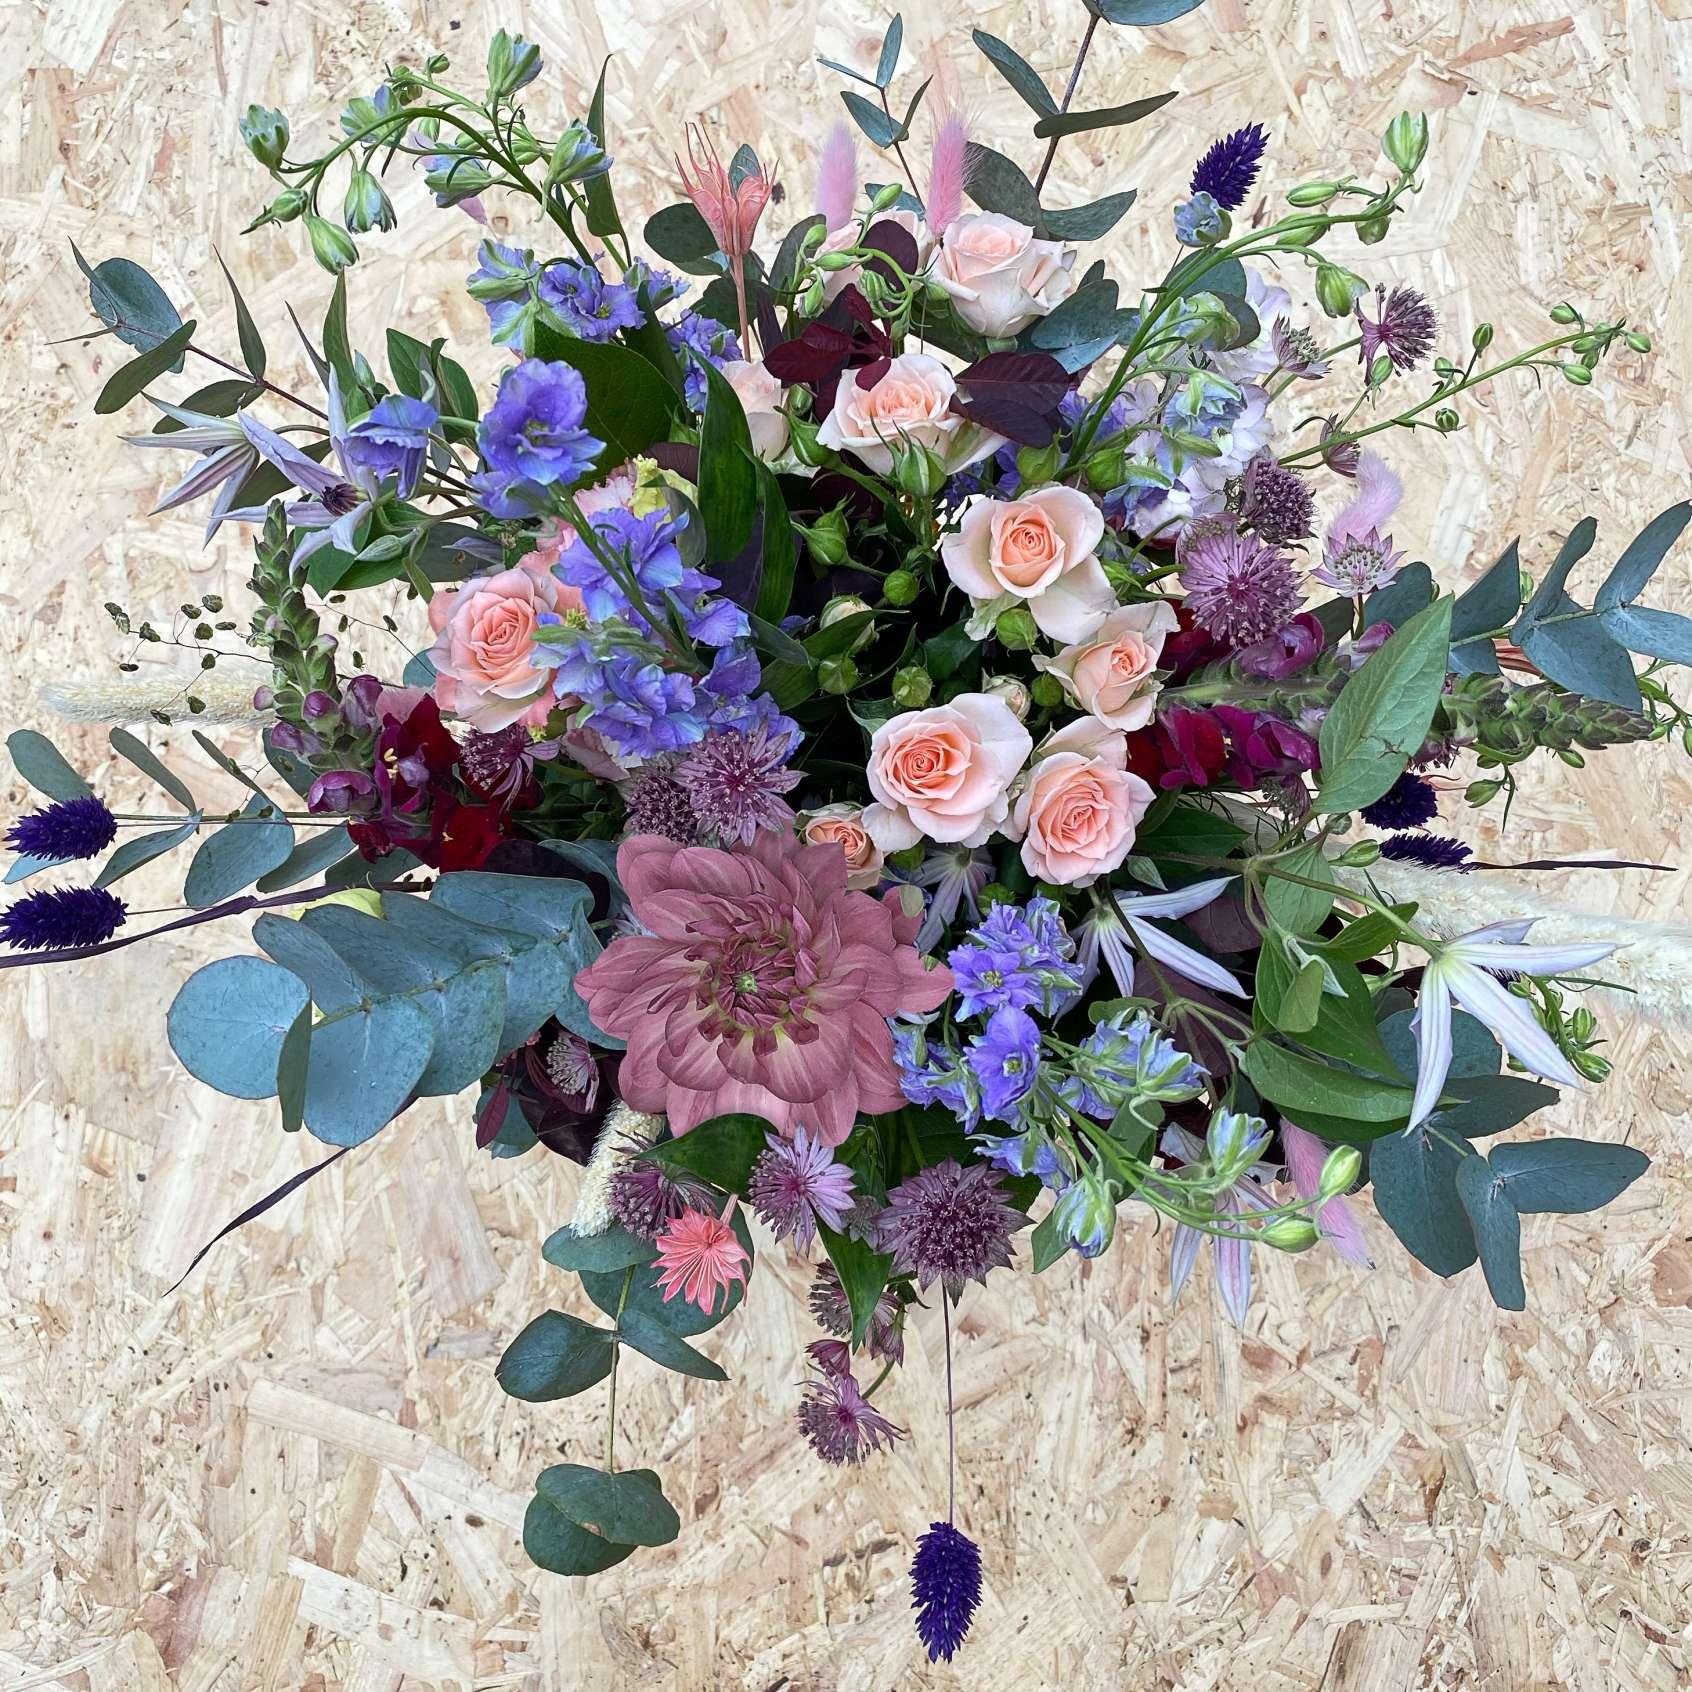 Pastel coloured hand-tied flower bouquet